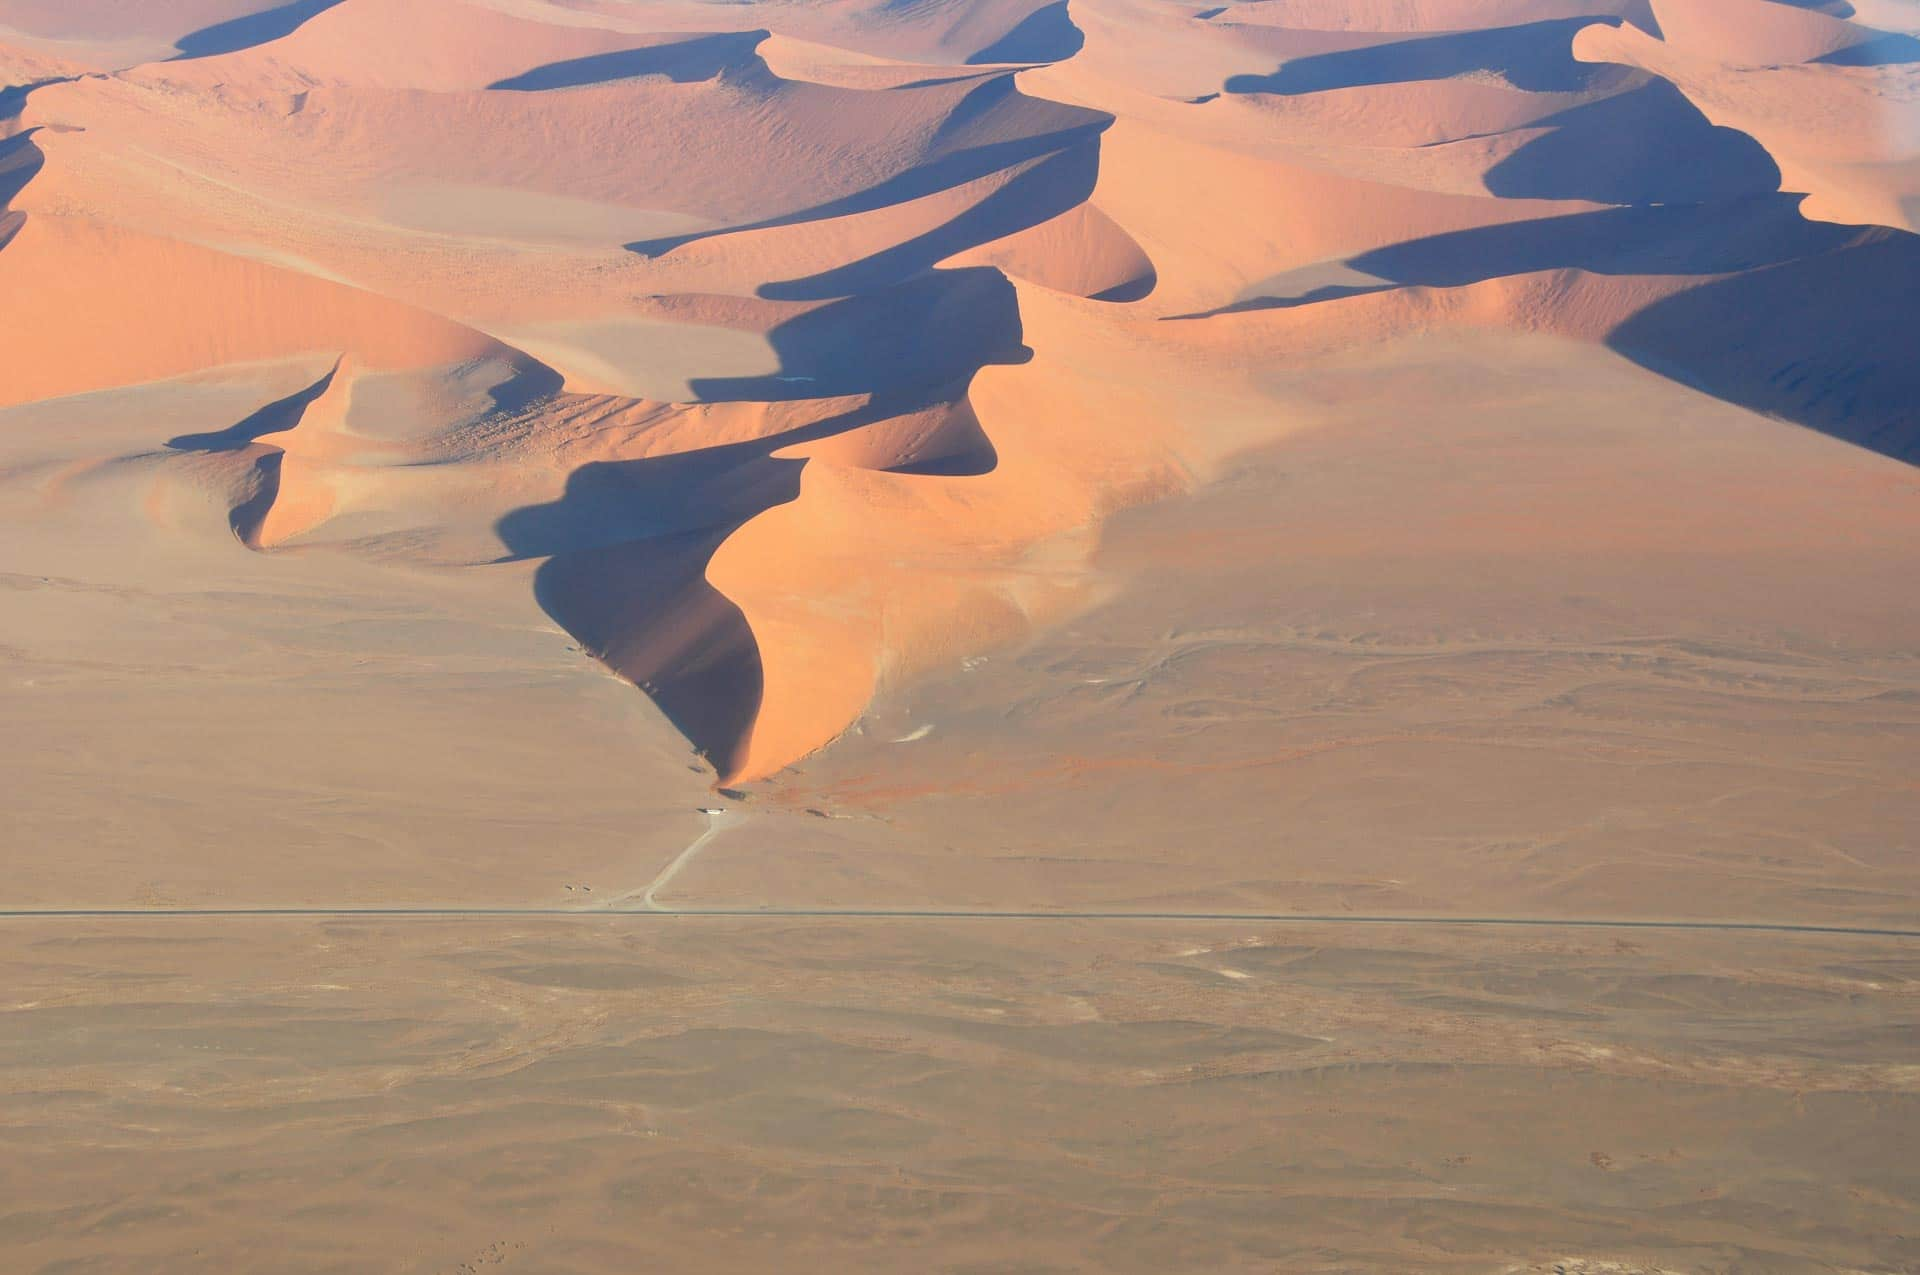 Sossusvlei-Namib-Naukluft-Namibia-Globetrotter-Select-517